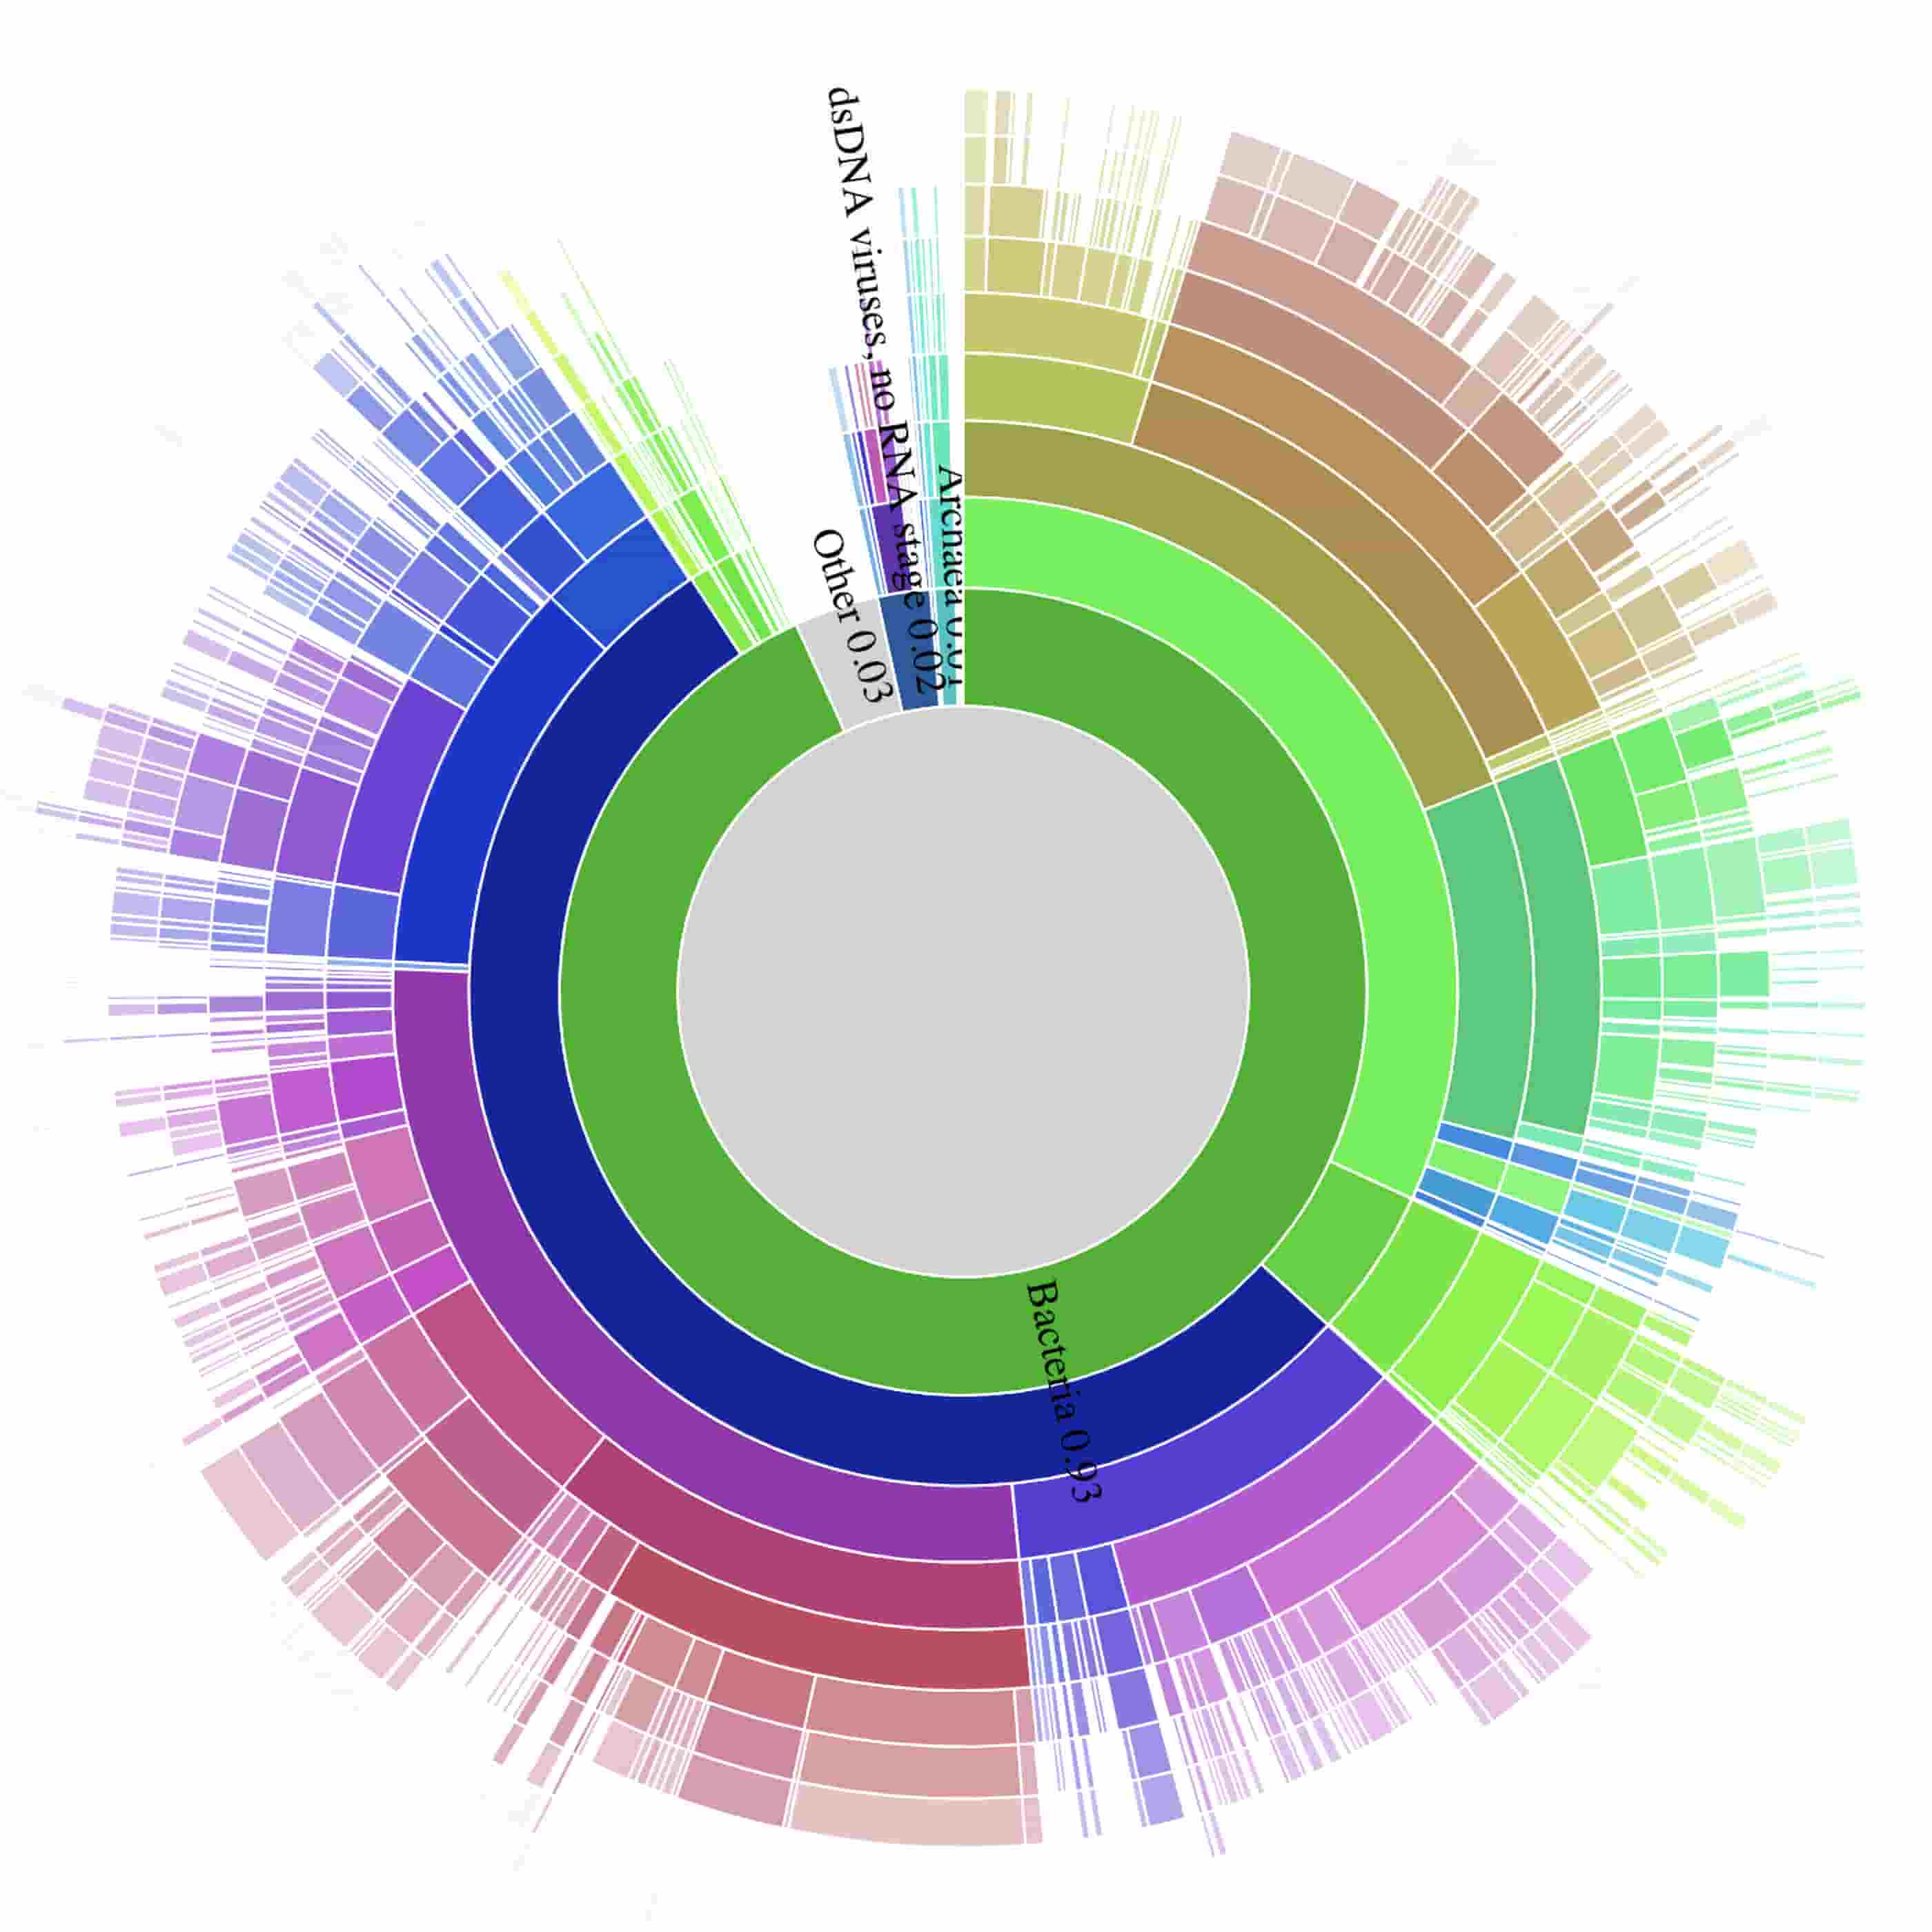 4_data visualization.png